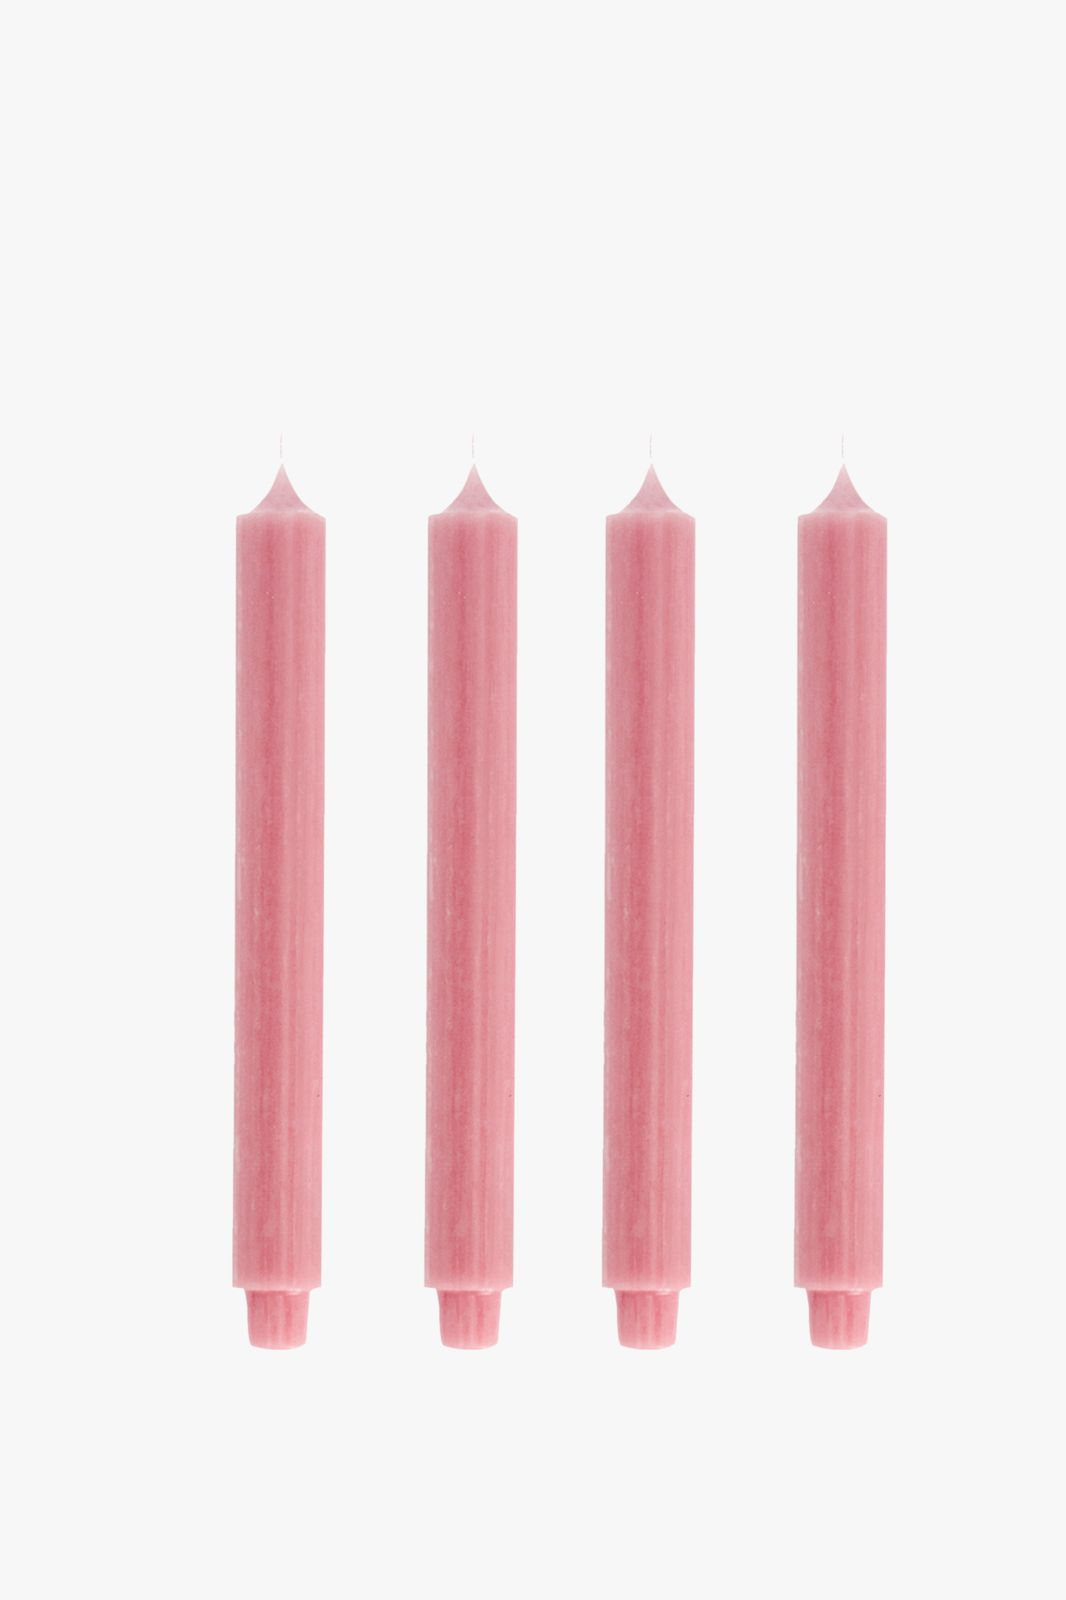 Dinerkaars antiek roze Ø 3,2 cm